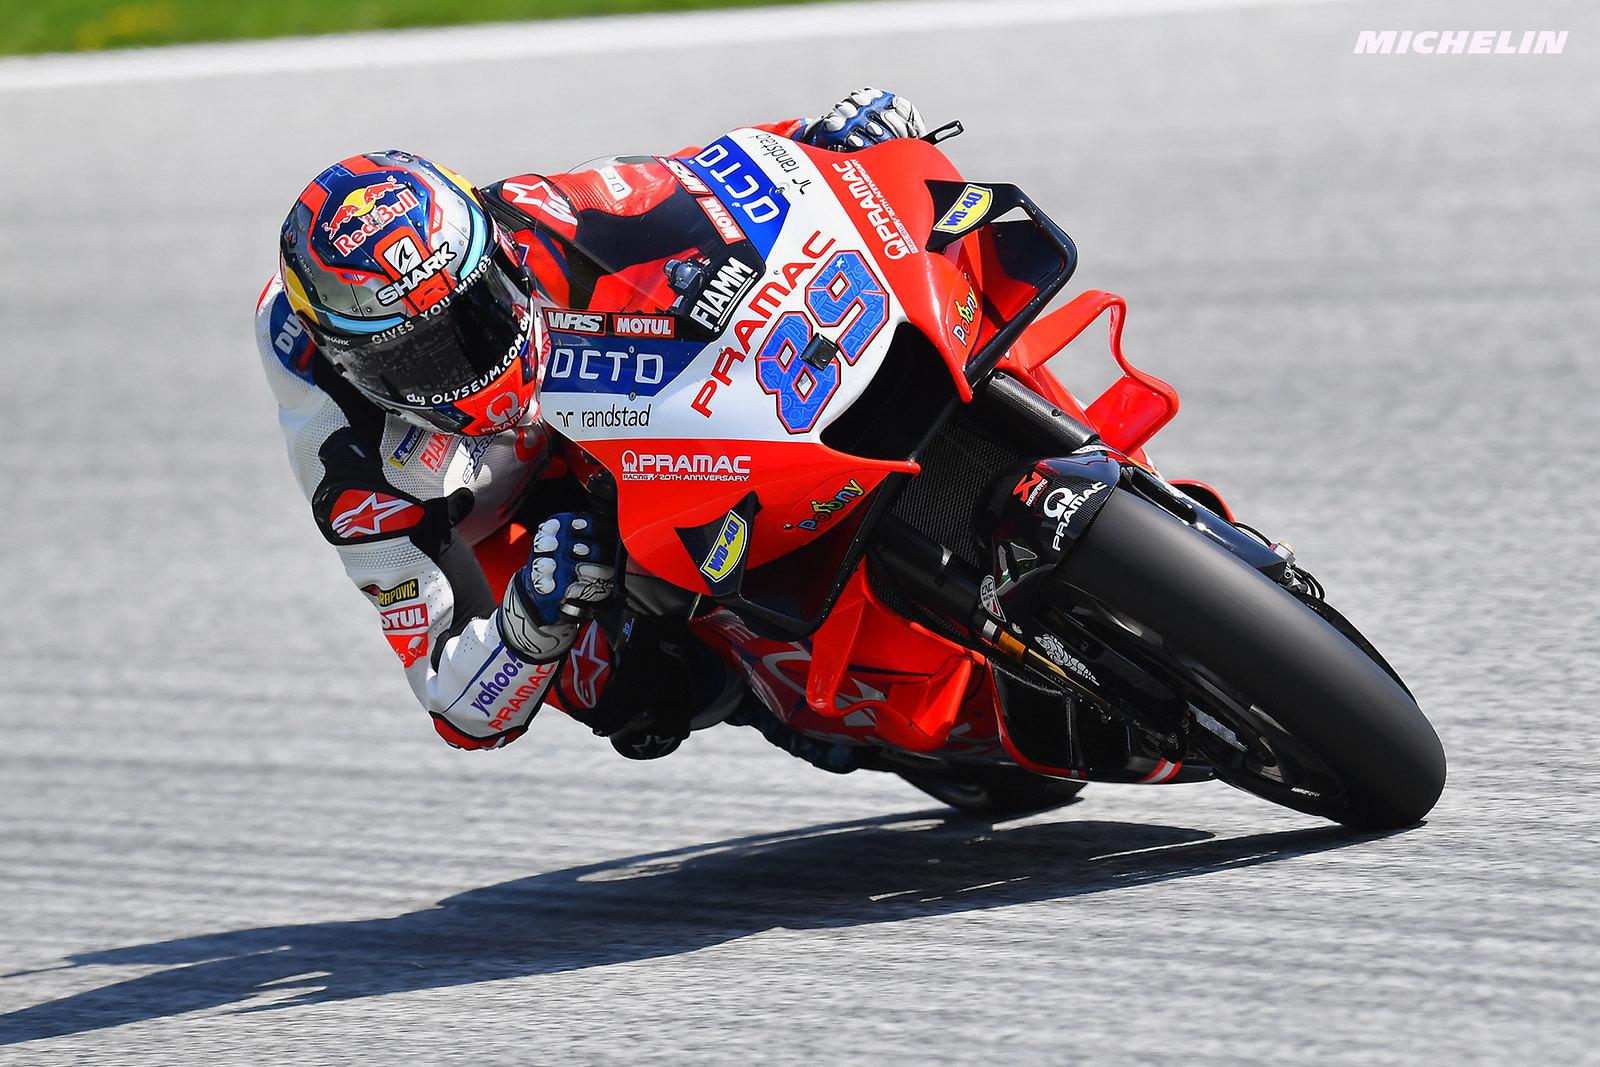 MotoGP2021オーストリアGP 予選1位ホルヘ・マルティン「予選ではしっかり自信を取り戻せた」